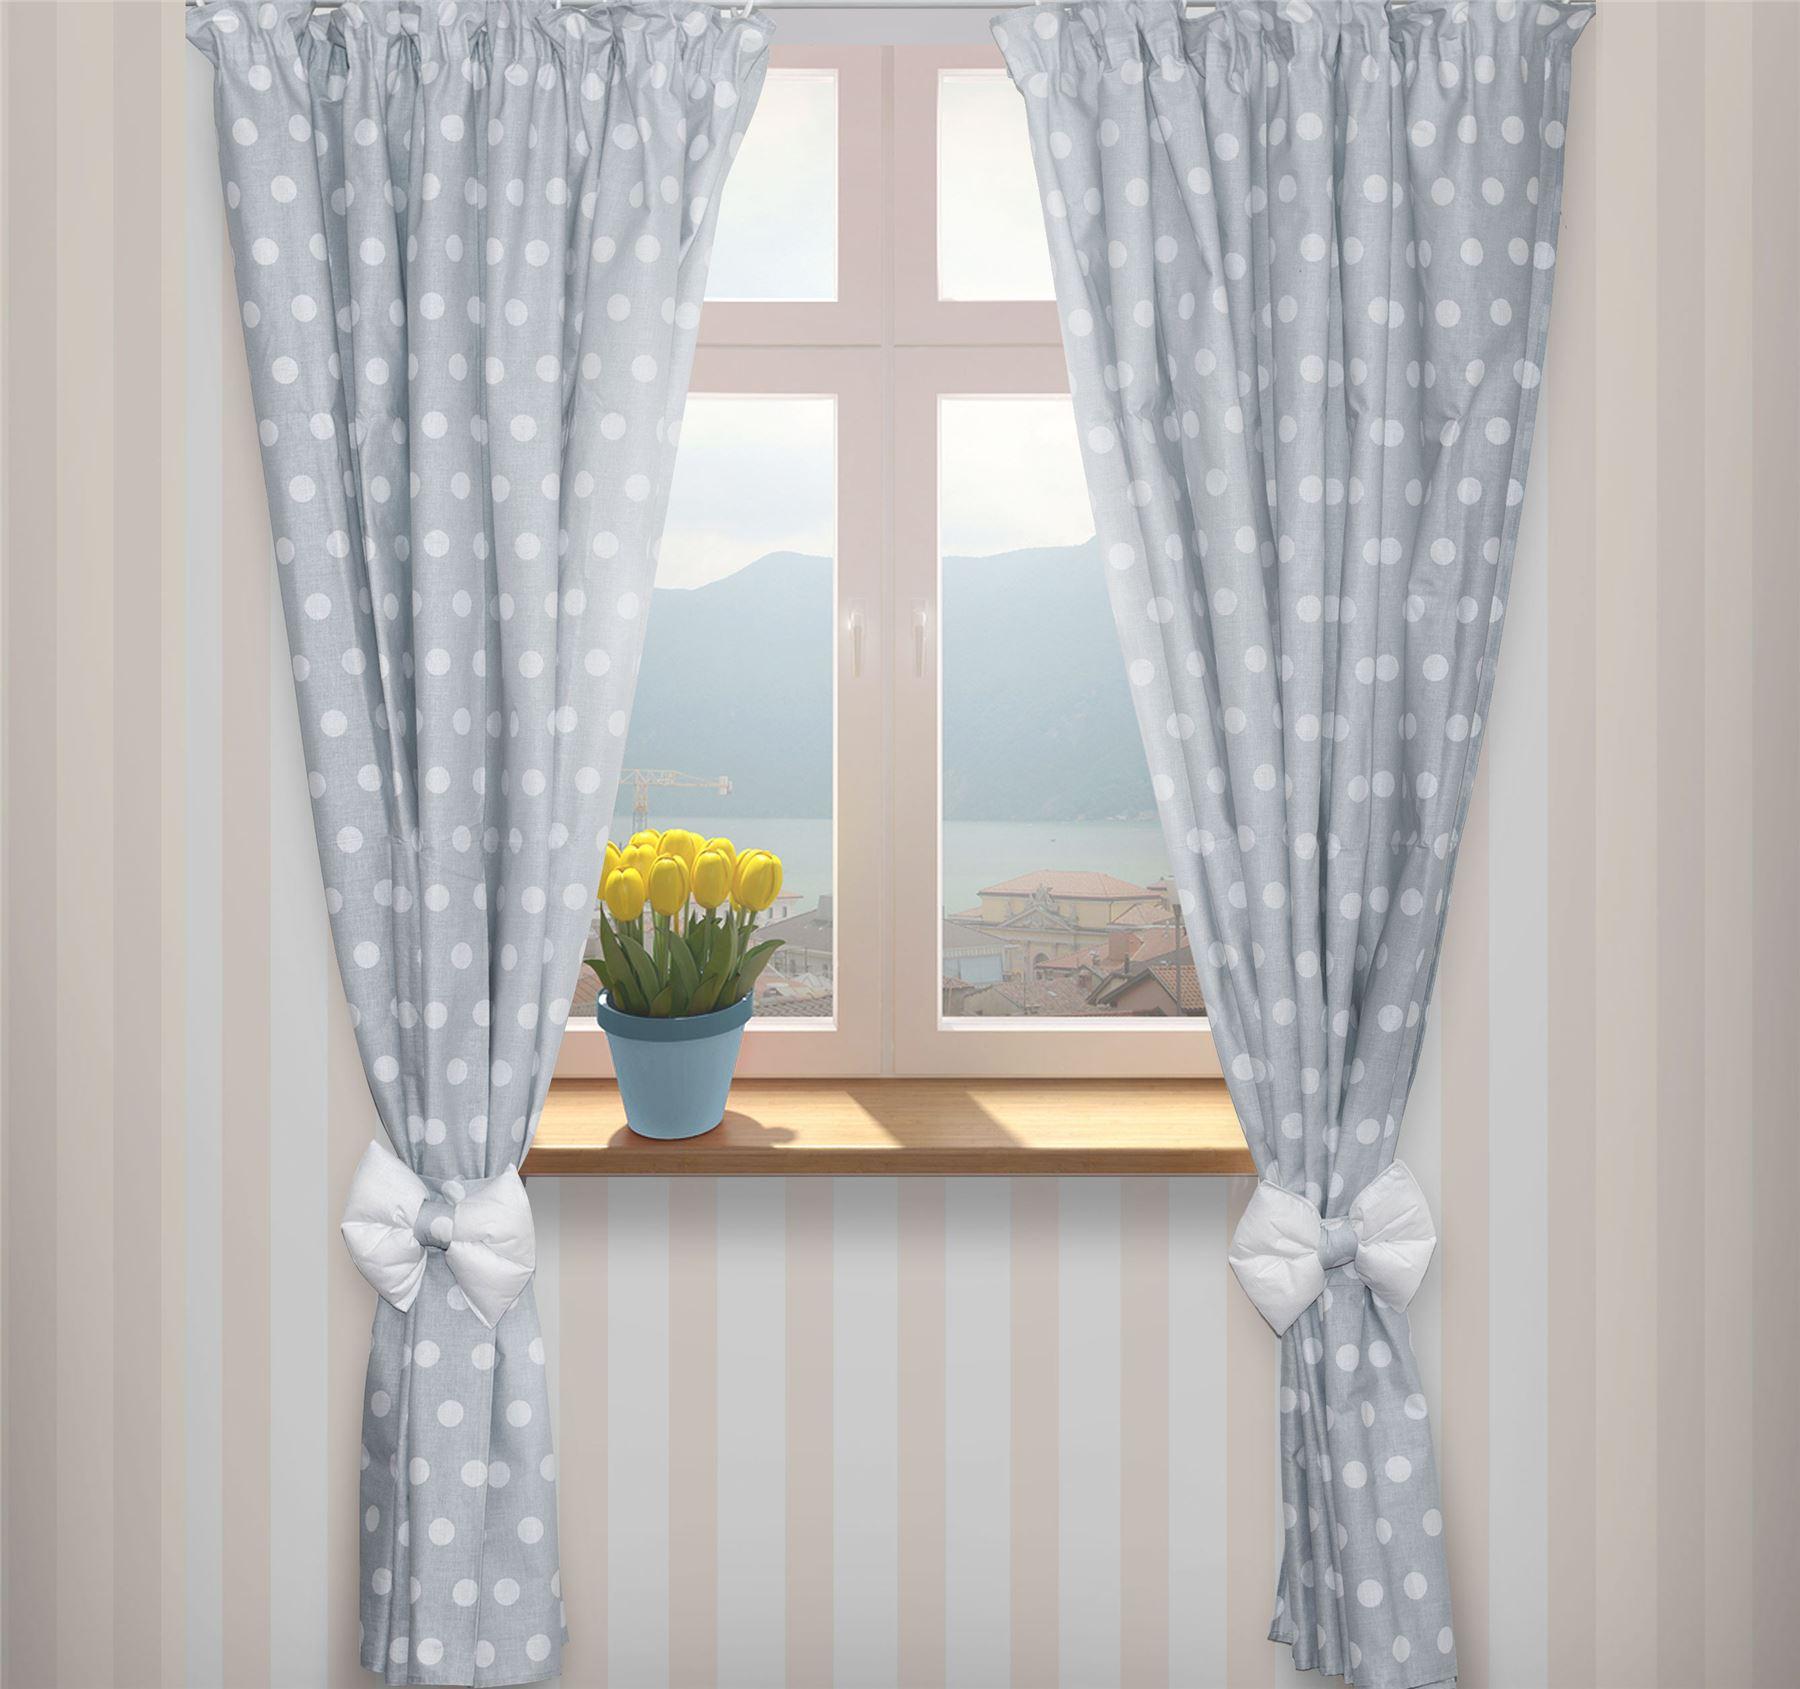 Luxuri s baby zimmer fenster vorh nge in passend muster for Fenster kinderzimmer